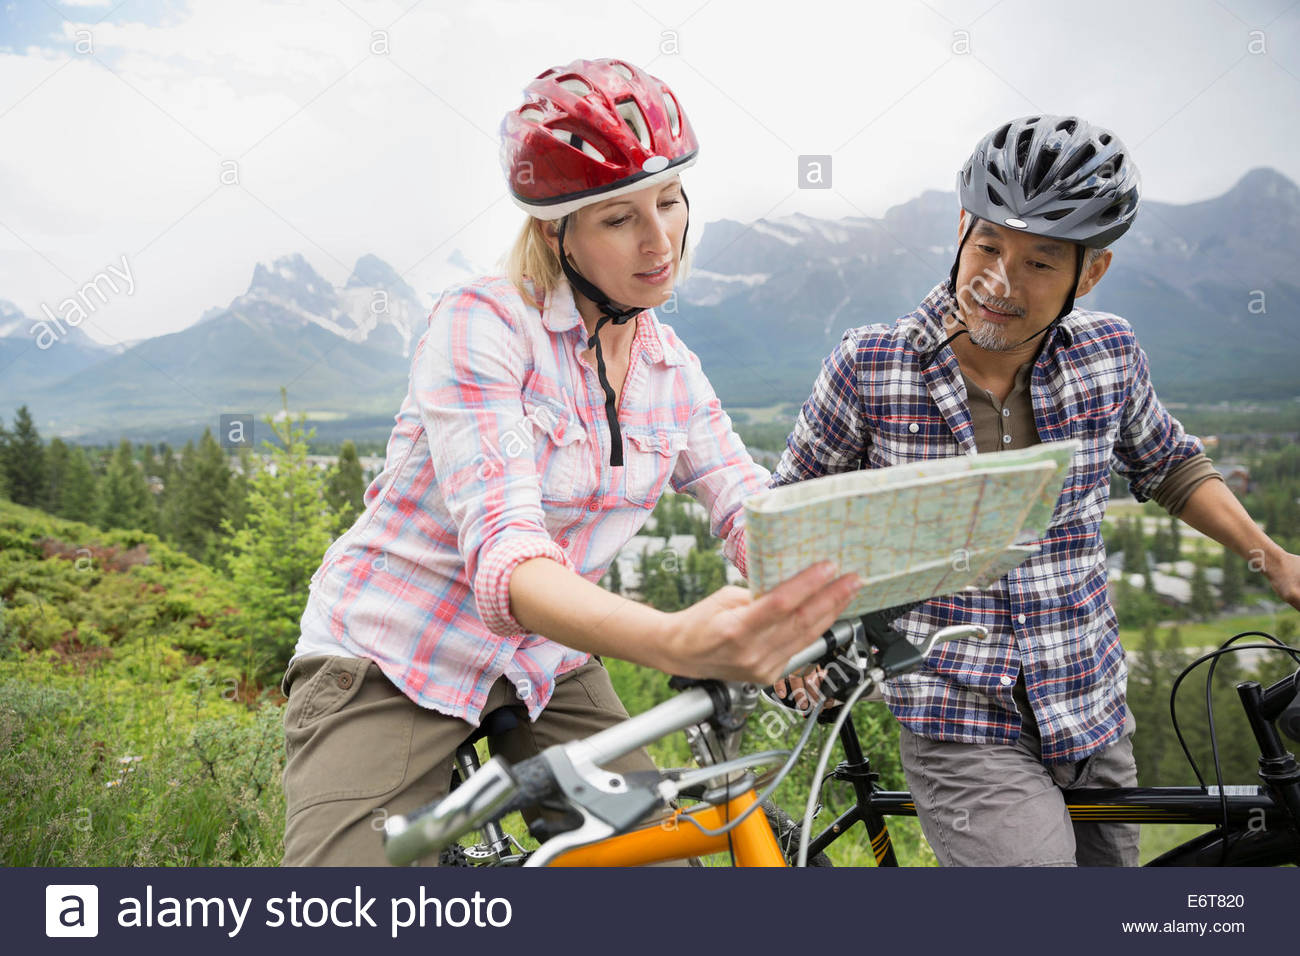 Couple on mountain bikes reading map on hillside - Stock Image